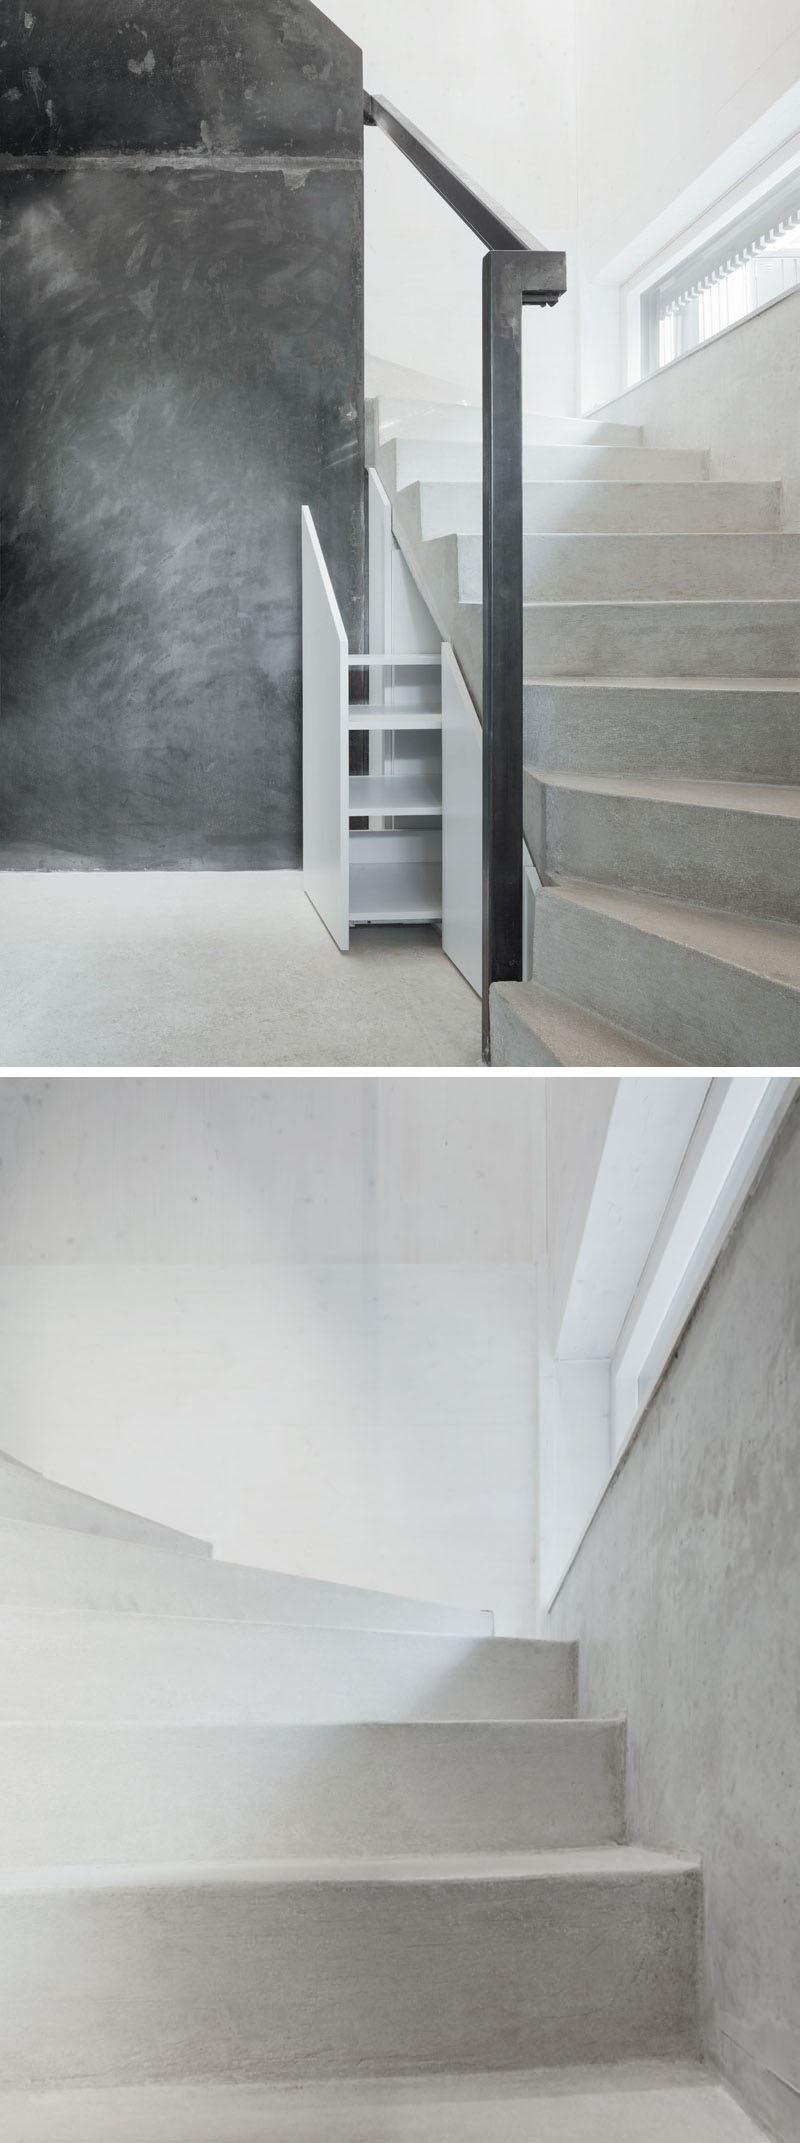 An Angular Exterior Surrounds The Minimalist Interior Of